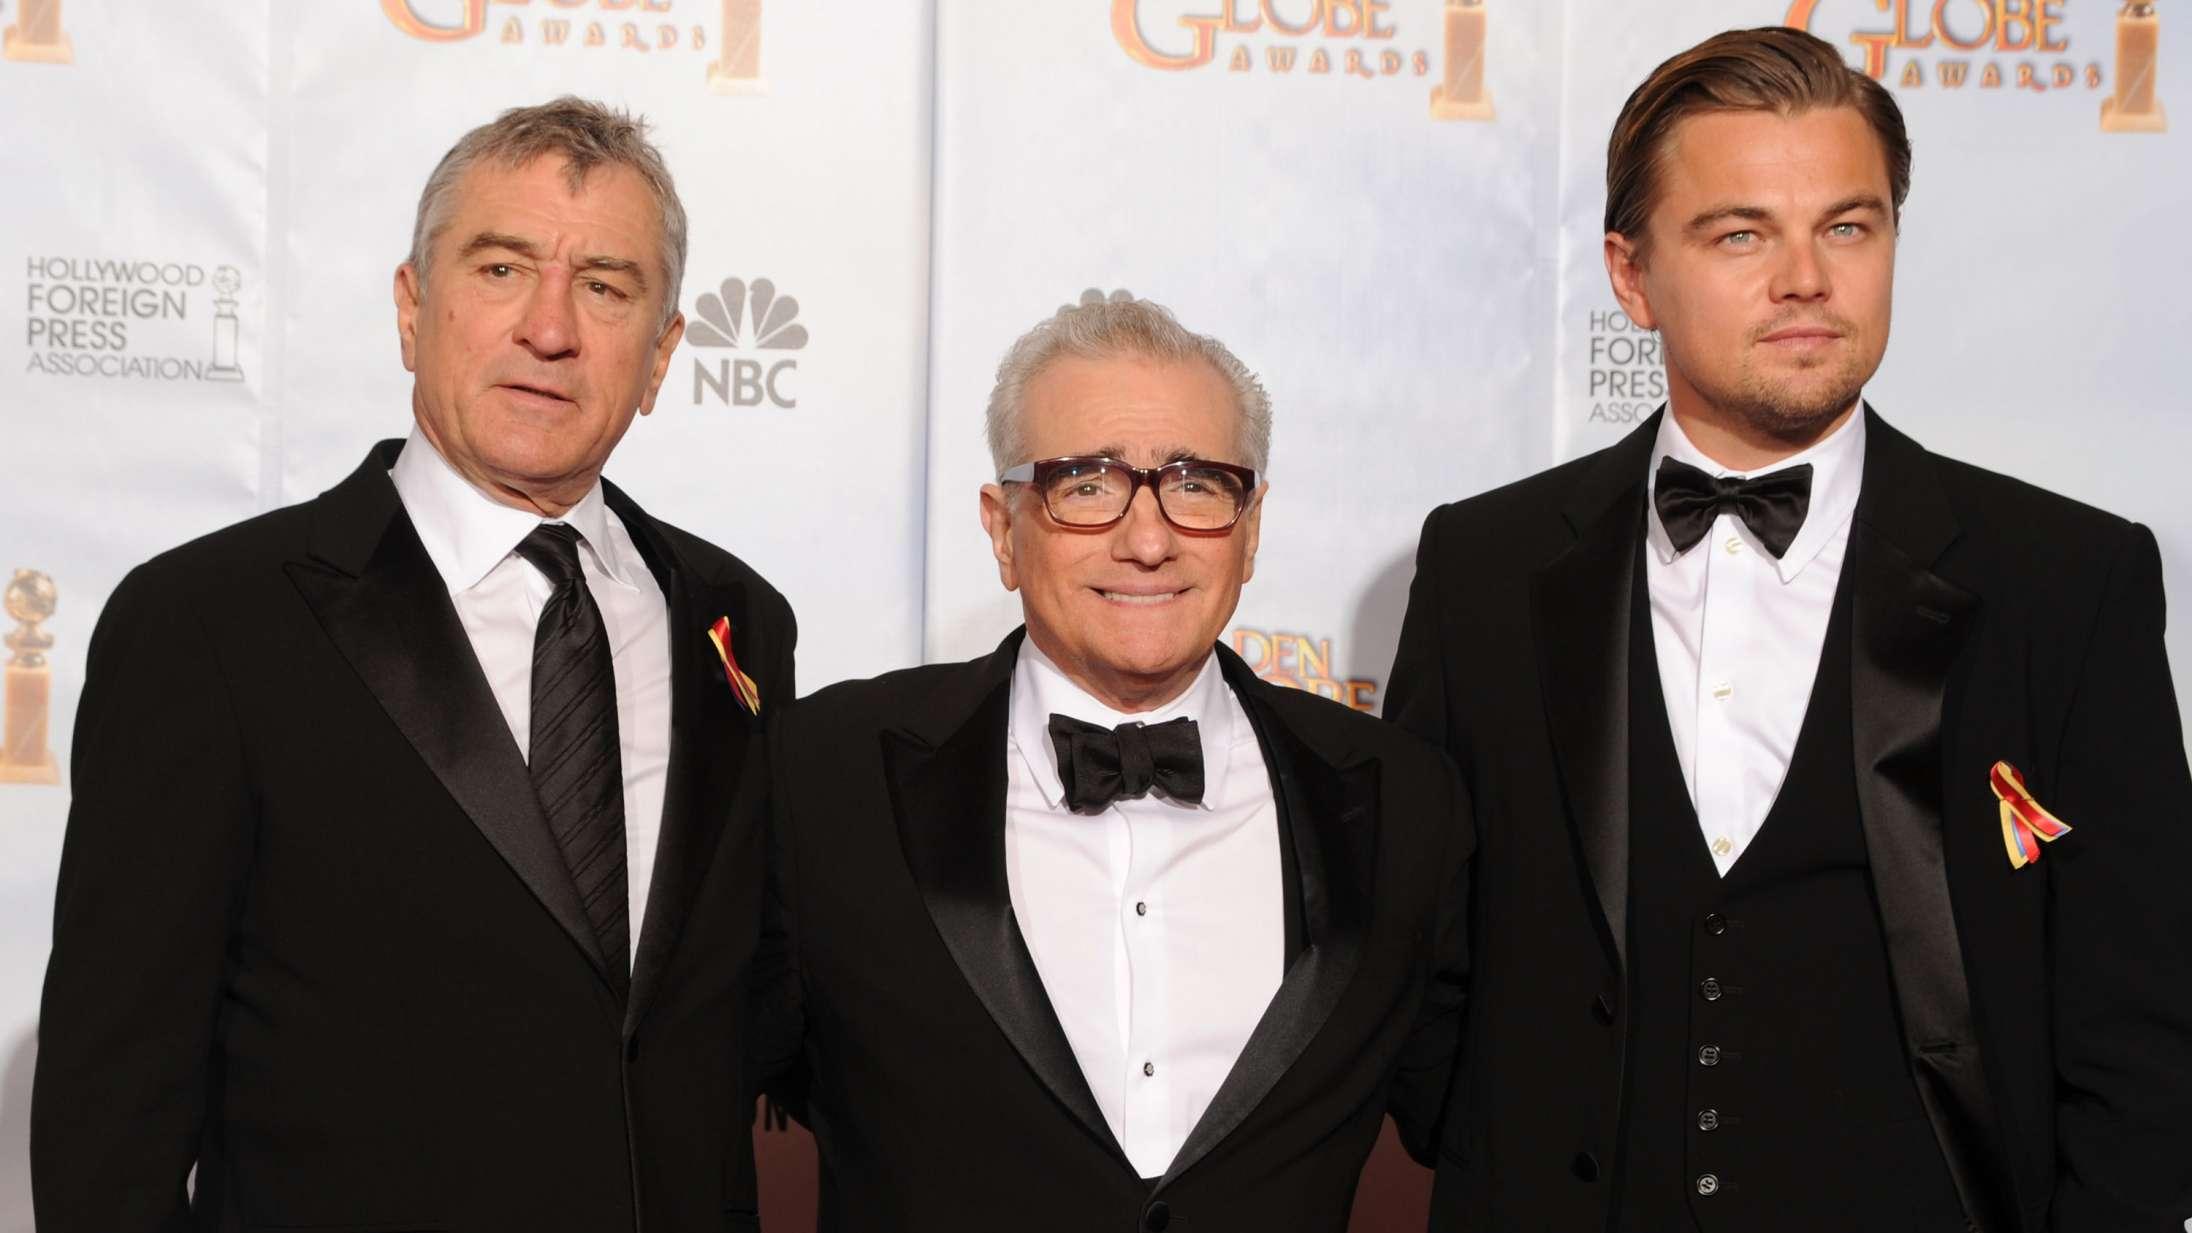 Martin Scorsese gør klar til optagelser på sin næste film – med Leonardo DiCaprio OG Robert De Niro